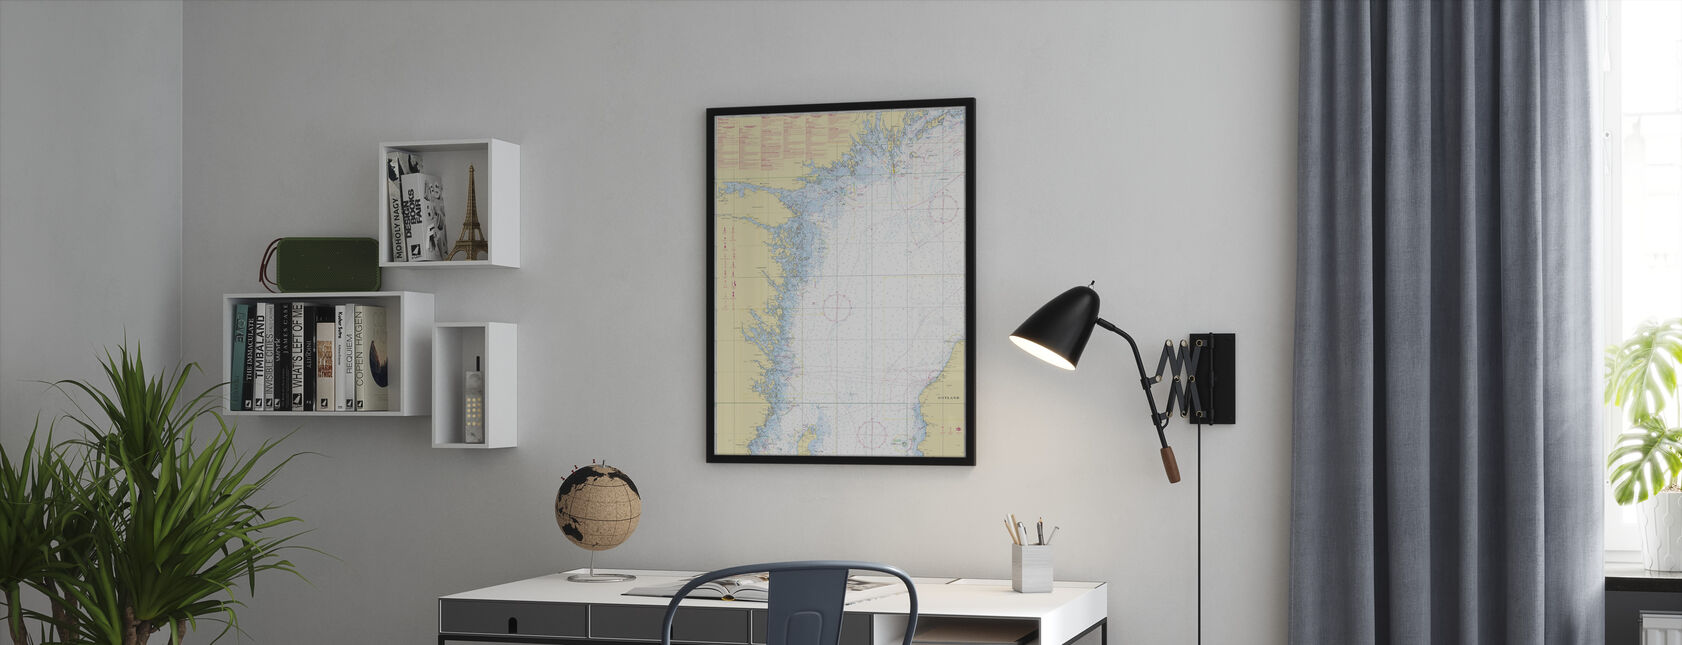 Sea Chart 72 - Oland - Landsort - Framed print - Office